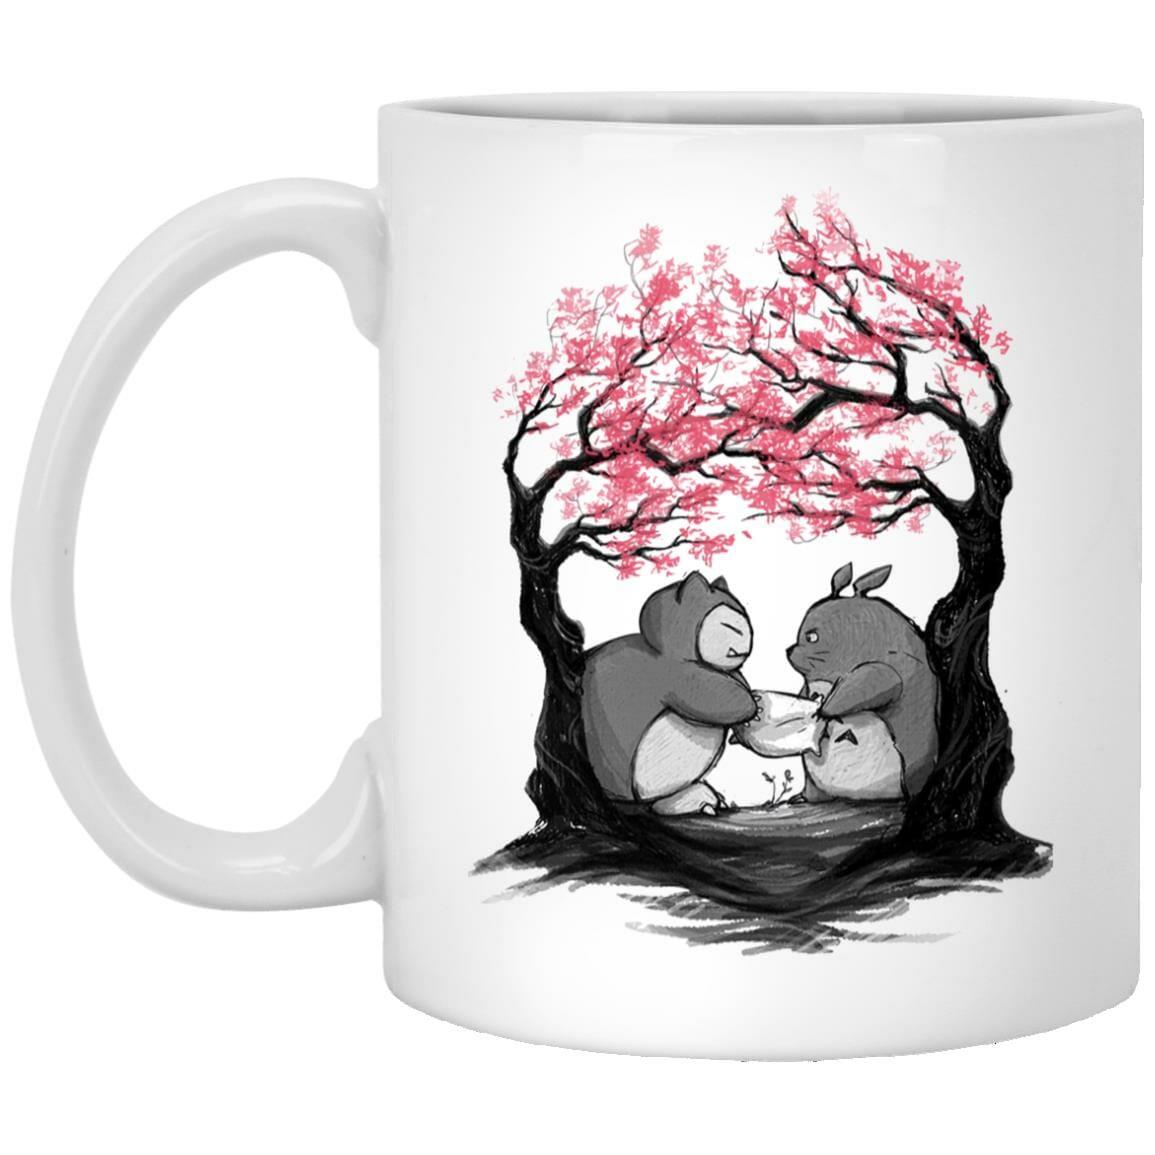 Totoro vs Snorlax Pillow fight Mug